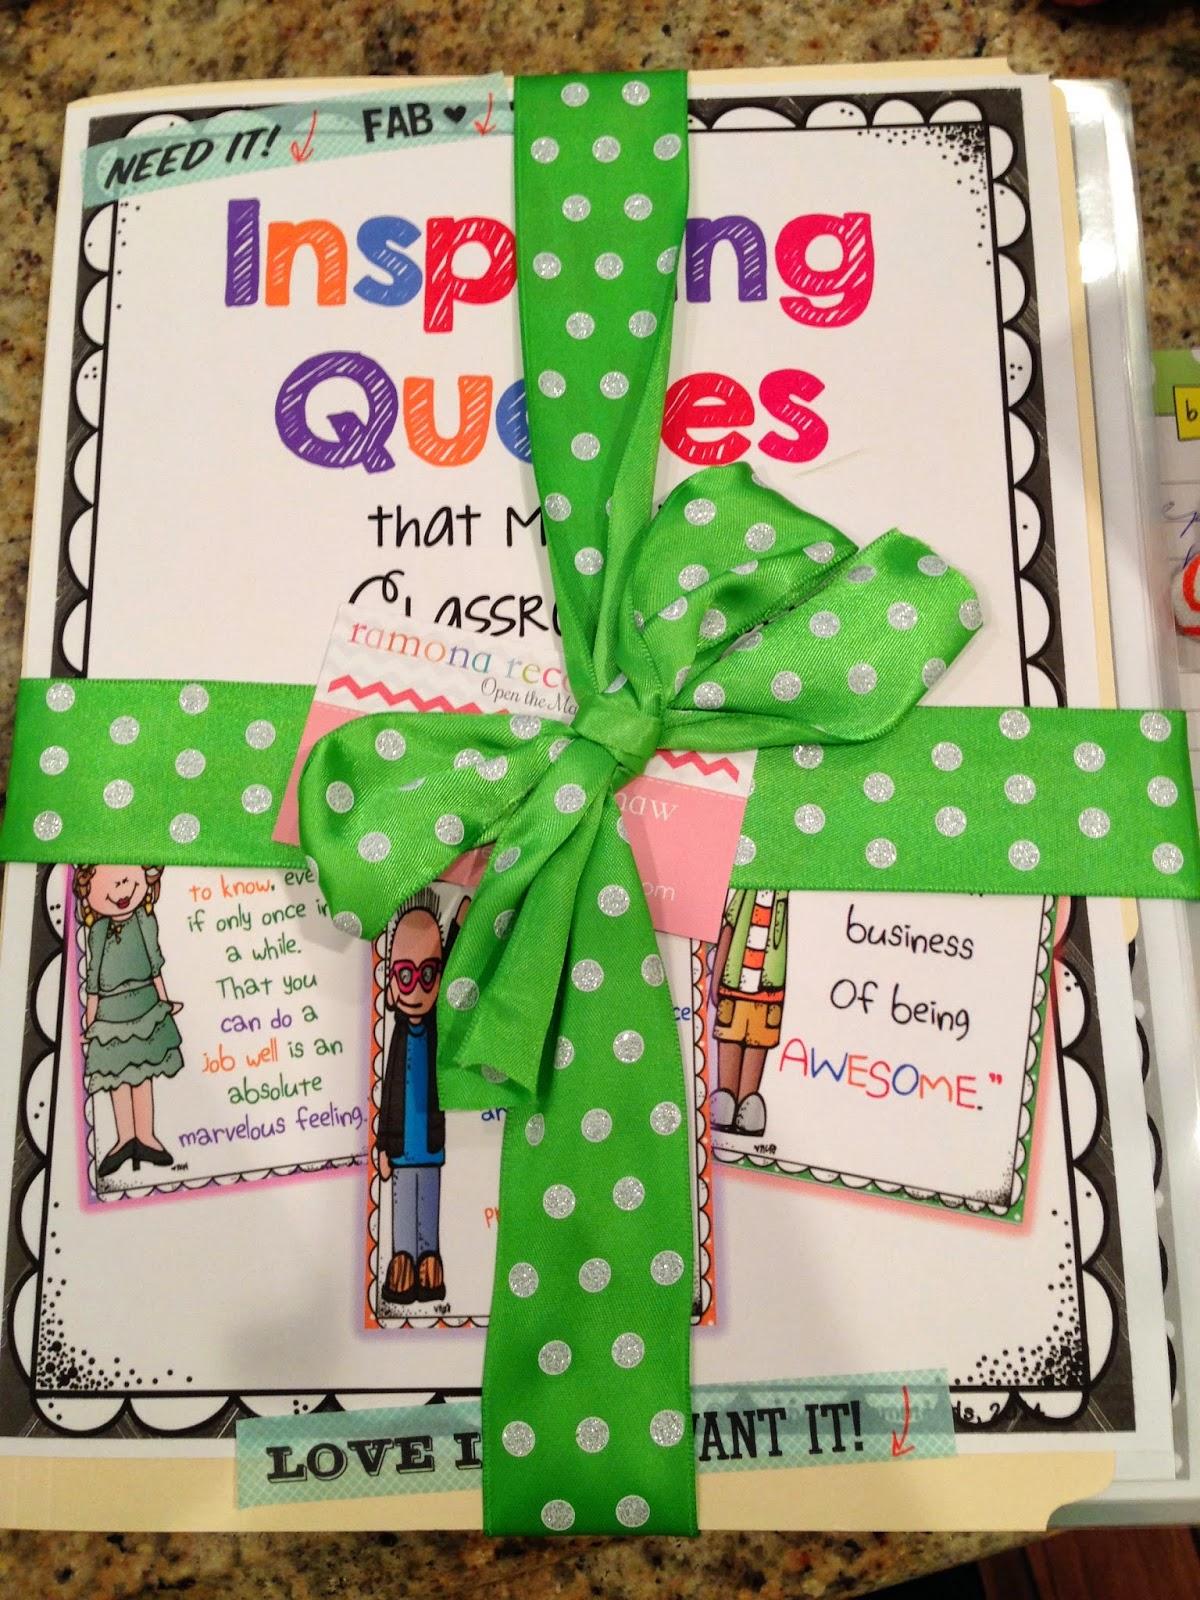 http://www.teacherspayteachers.com/Product/Inspiring-Quotes-for-your-Classroom-Decor-SET-II-1130416